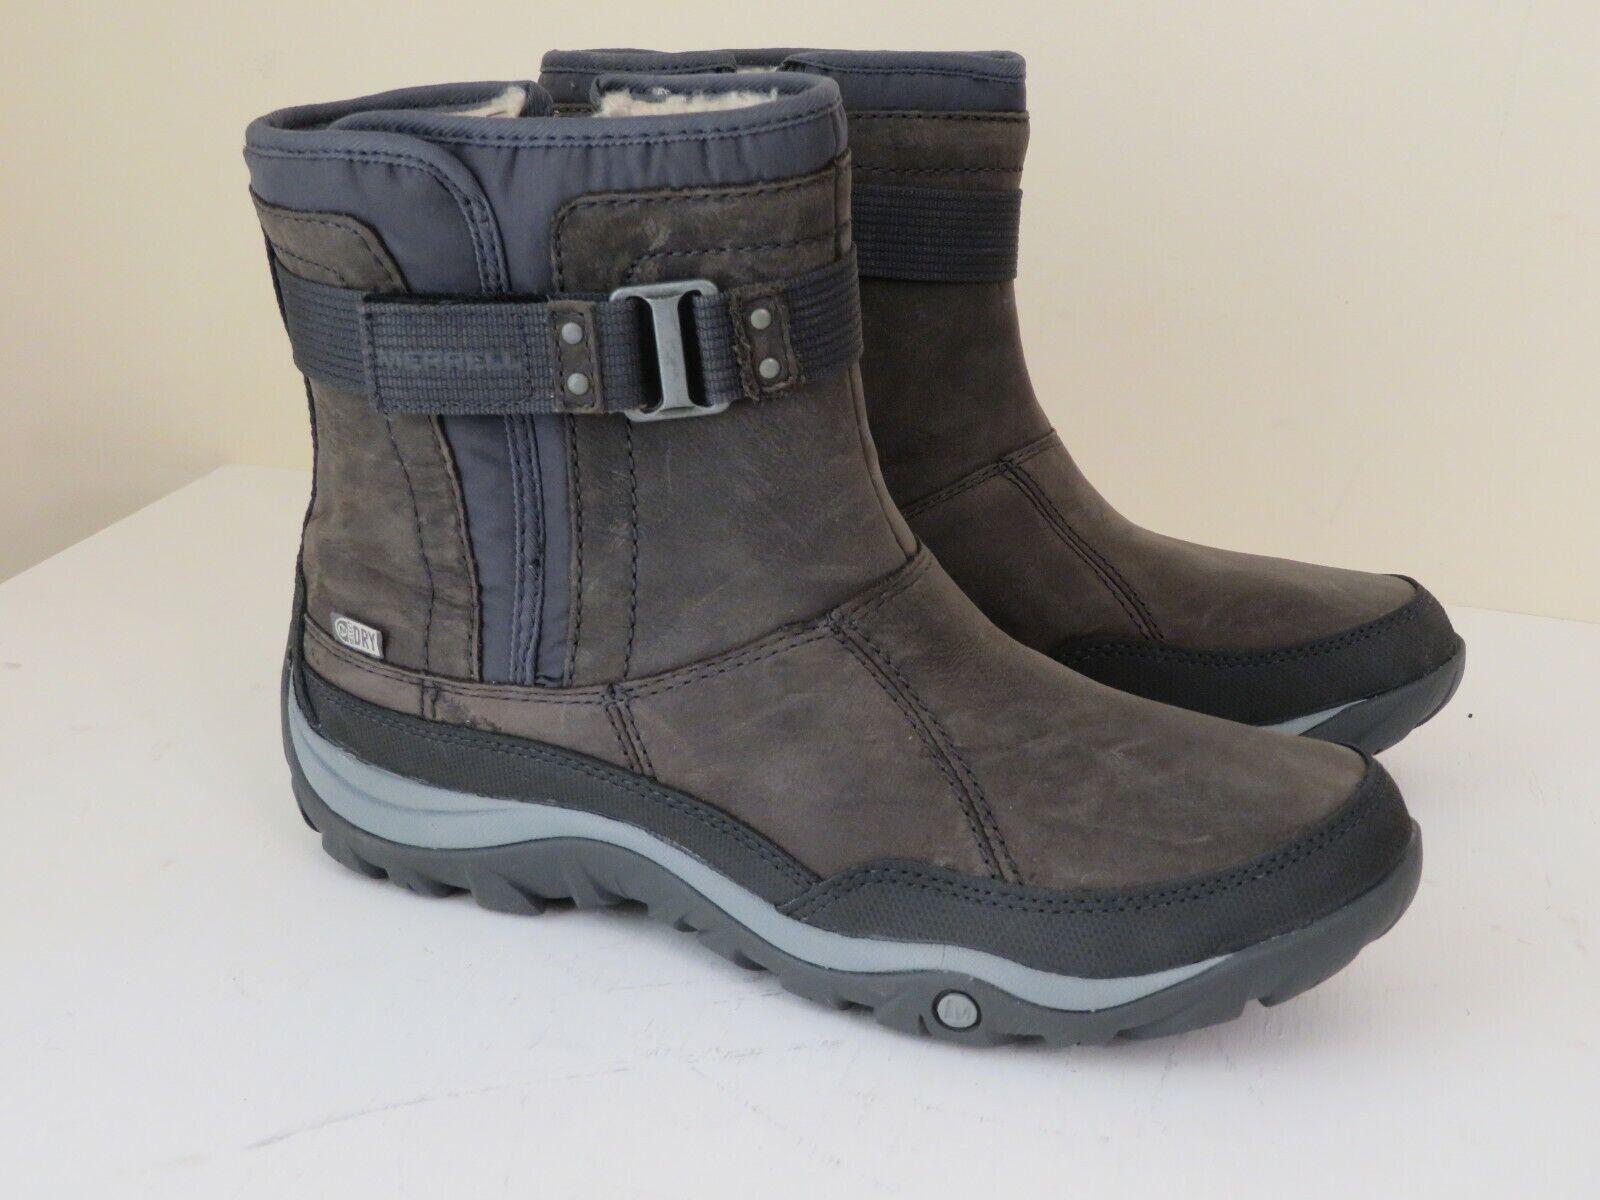 Merrell Impermeable De Cuero Correa De Tobillo botas Murren Estaño Nuevo 7.5